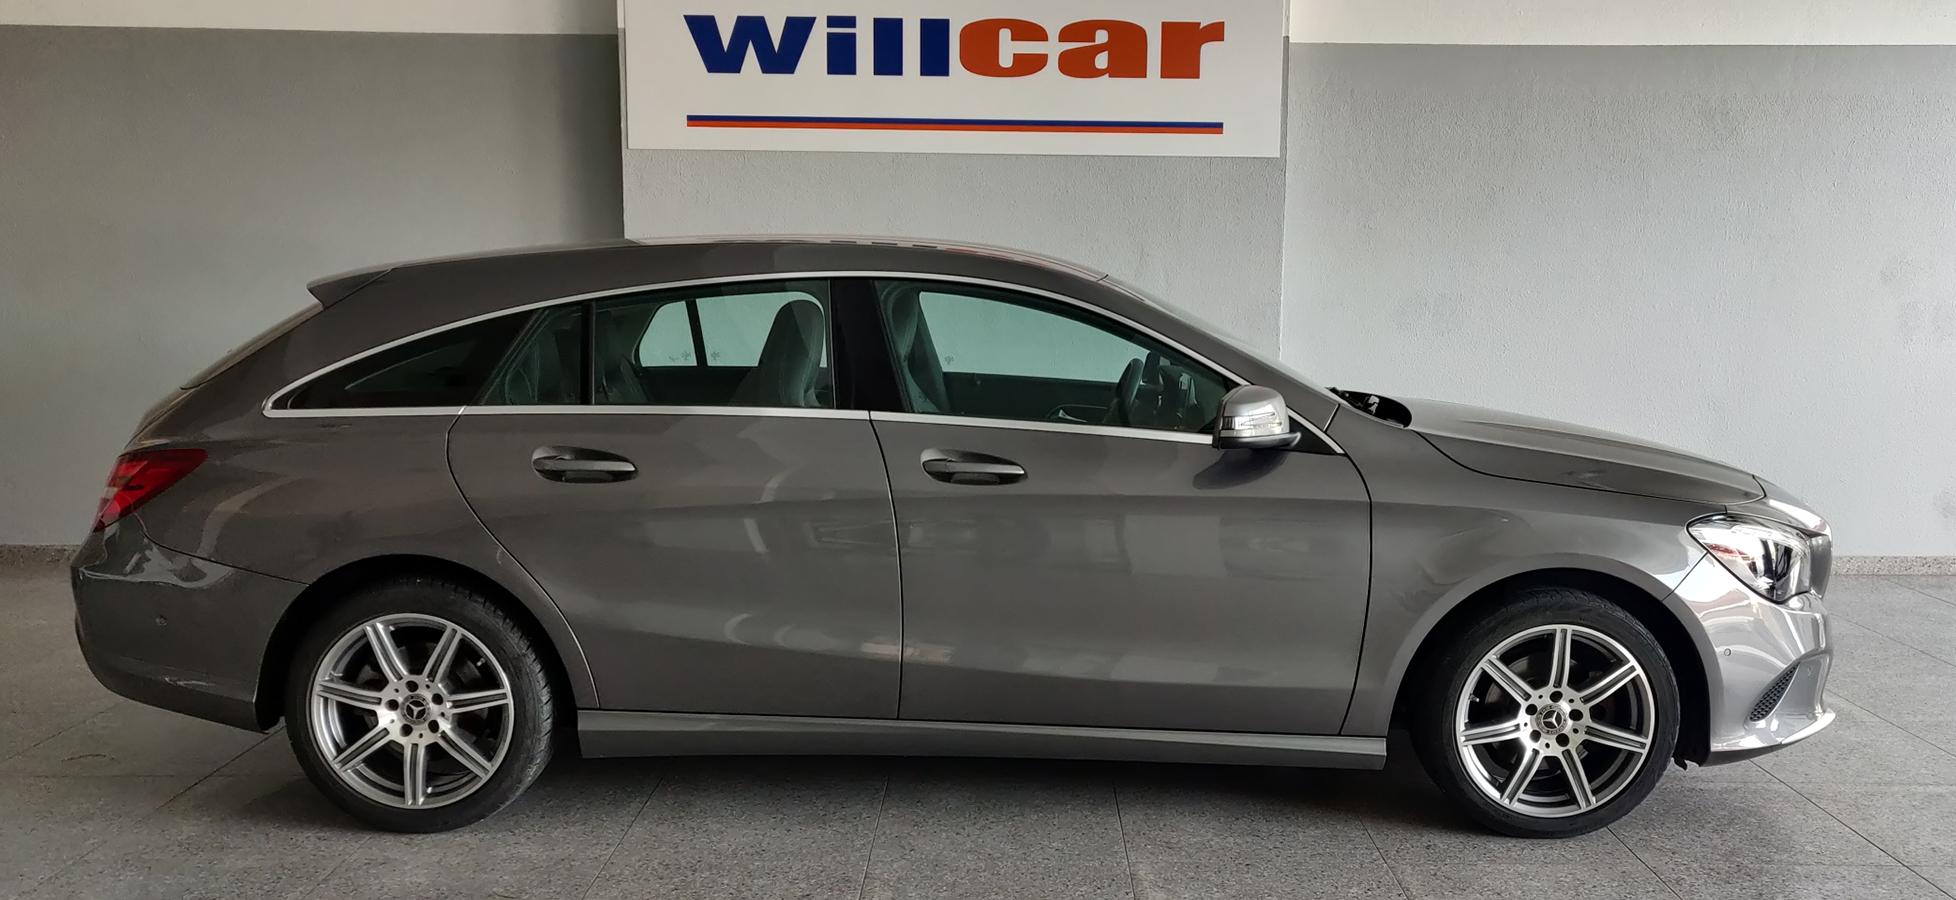 Mercedes-Benz CLA 180 1.5 Style | Imagem 3